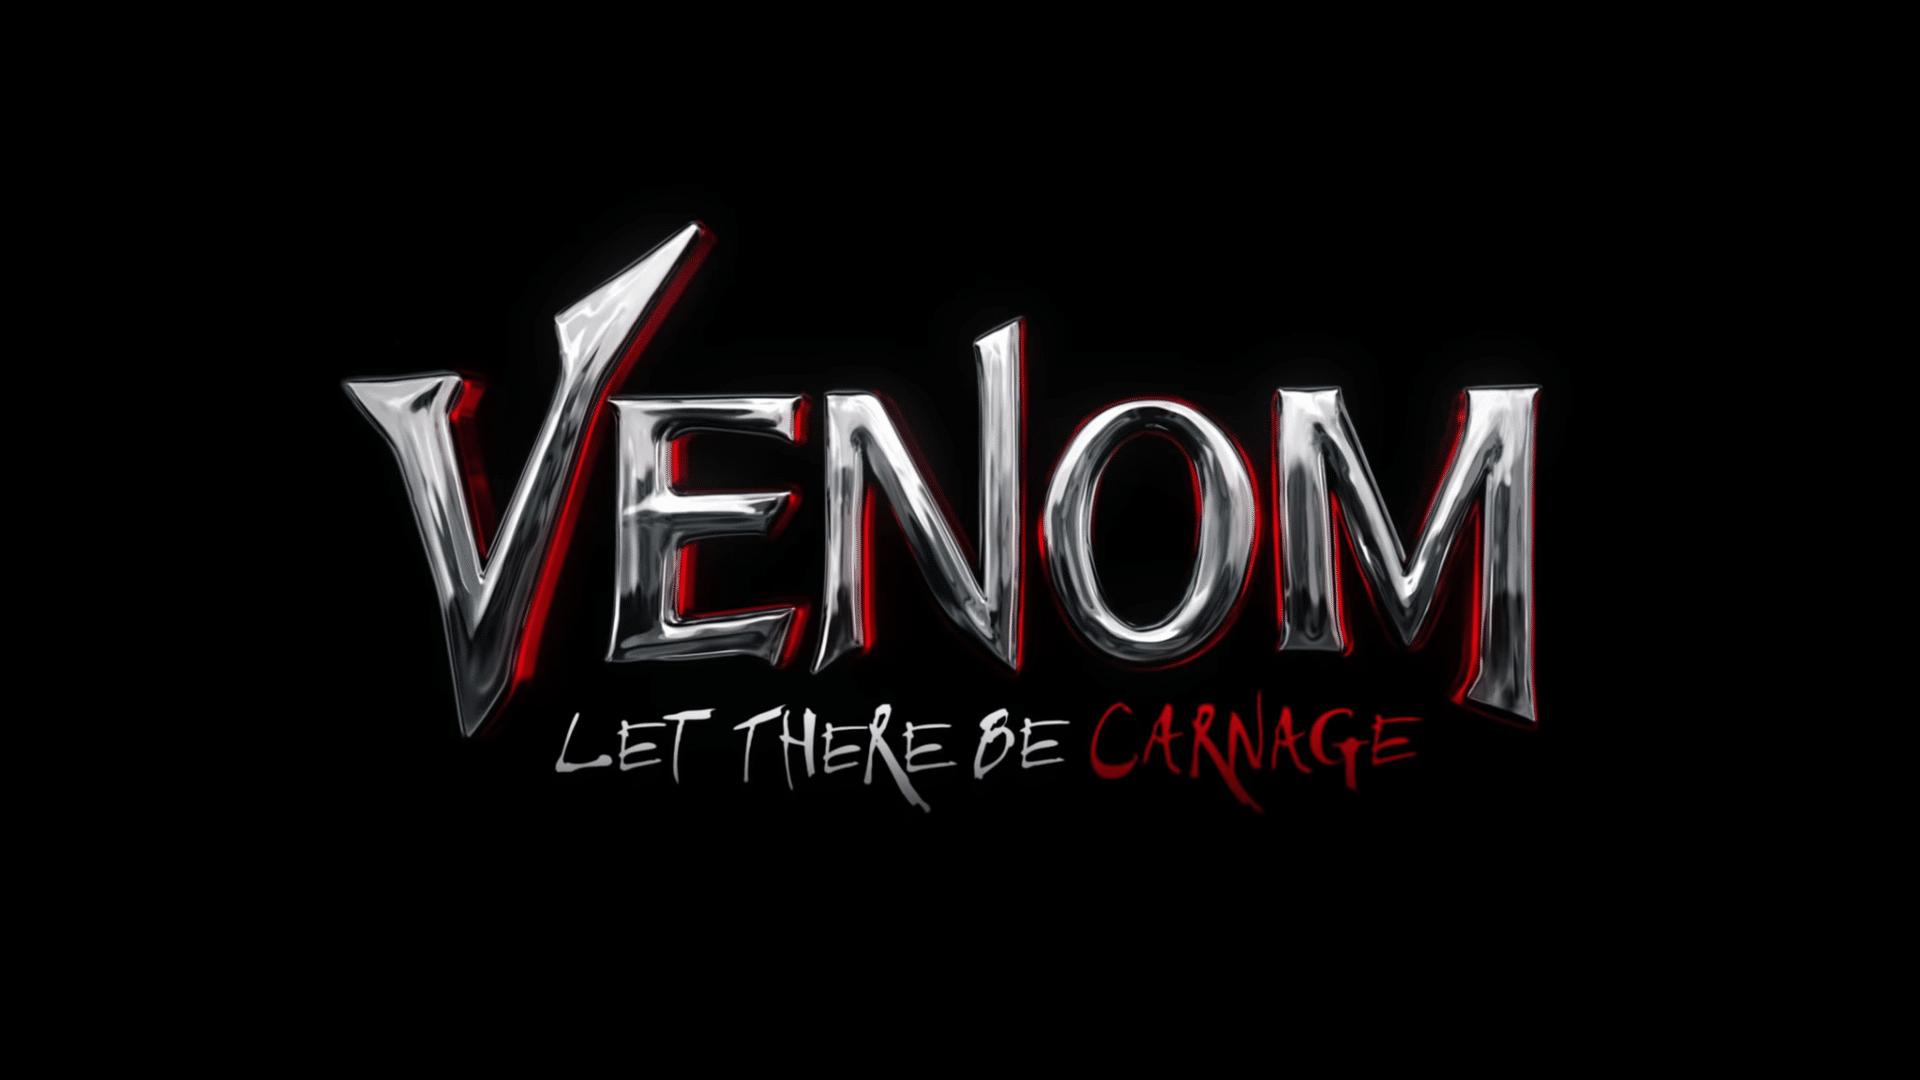 'Venom 2: Let there be carnage' estrena trailer oficial